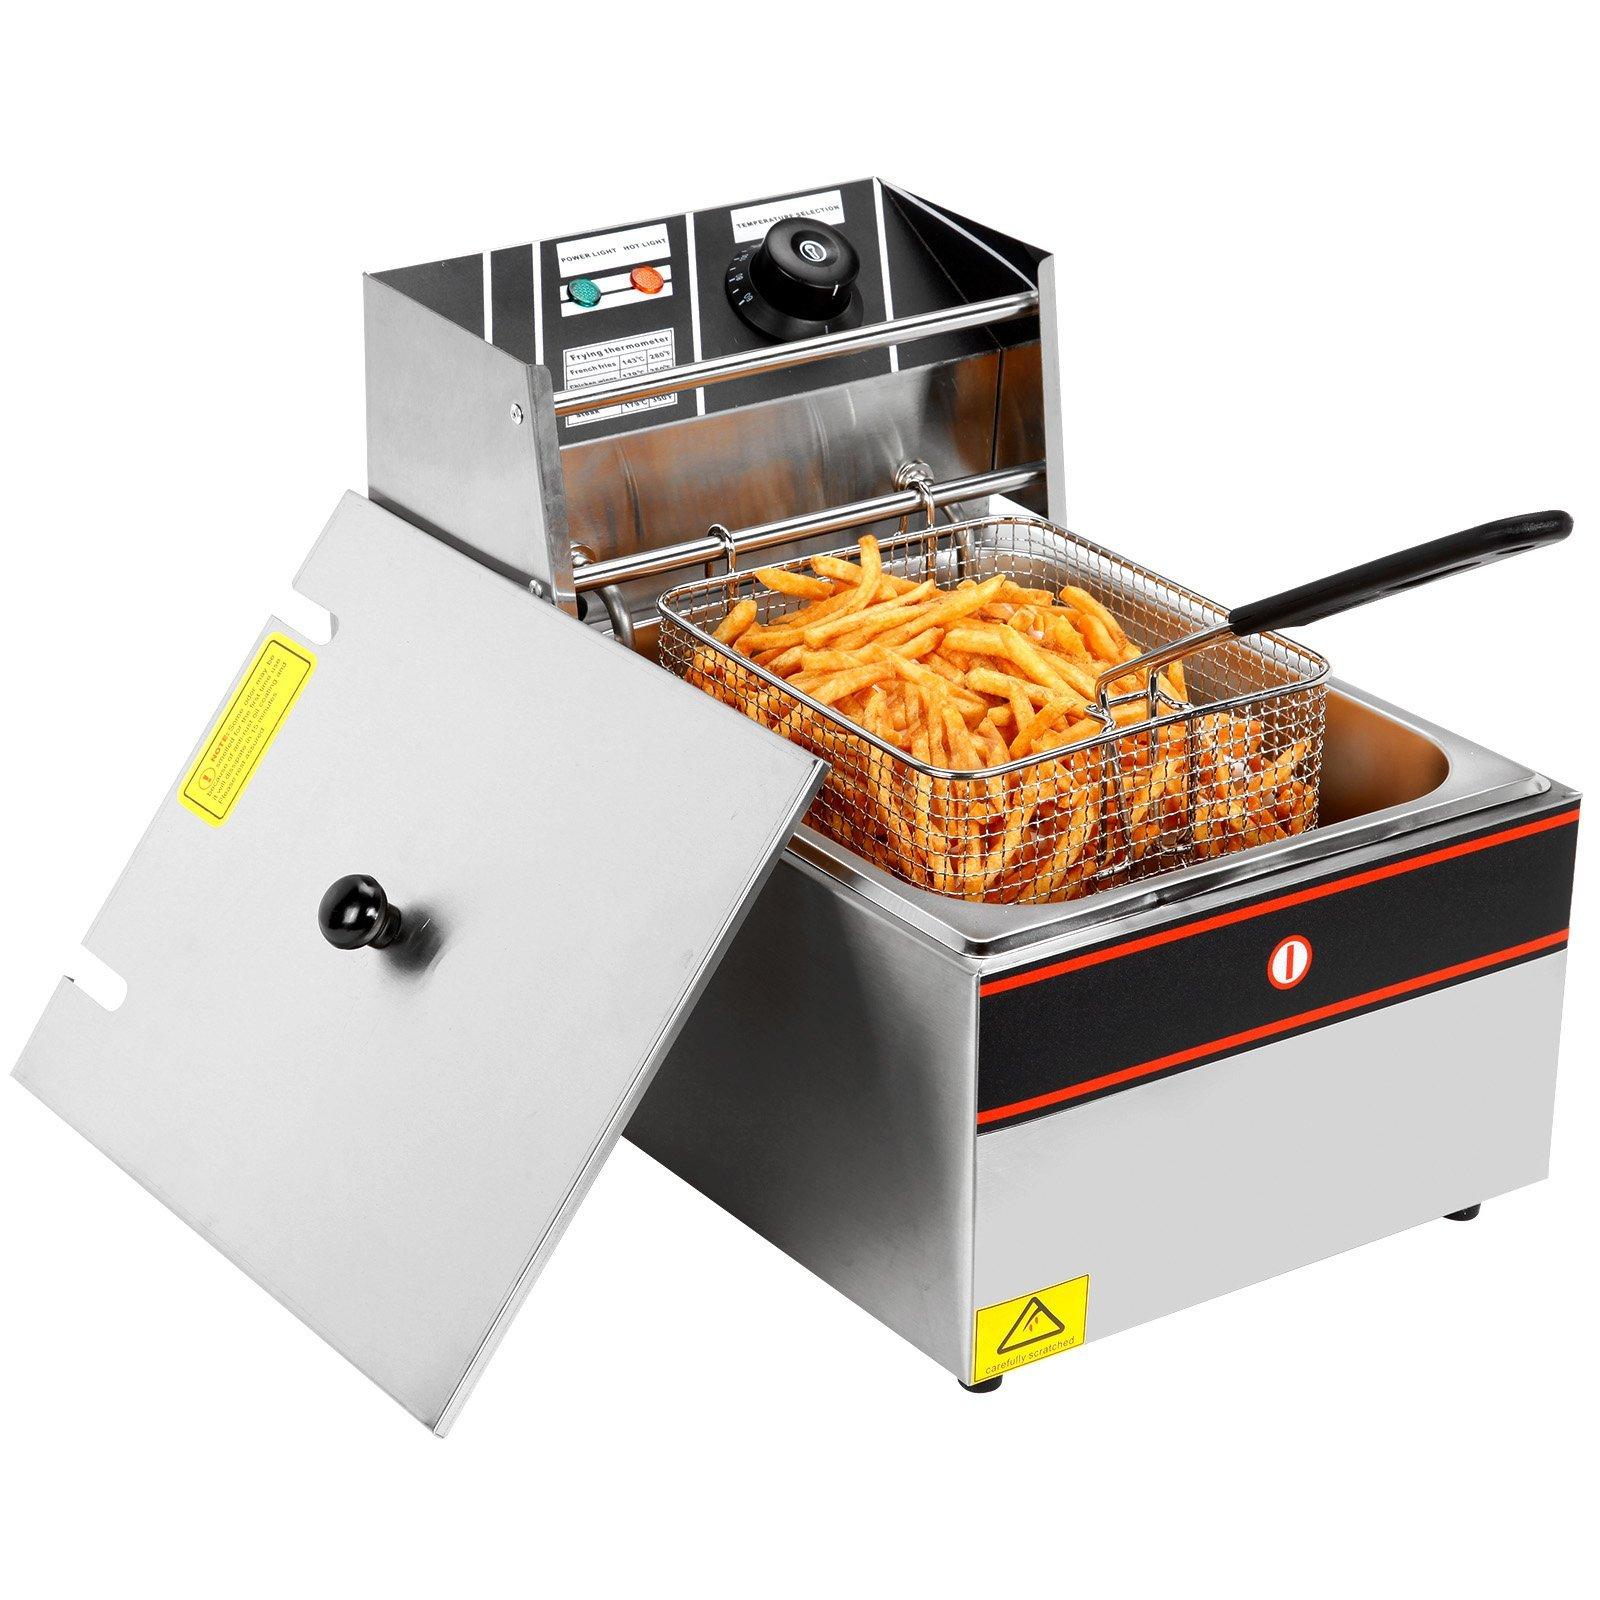 2500W 6L Single Tanks Electric Deep Fryer Professional Tabletop Restaurant kitchen Frying Machine With 1 Basket